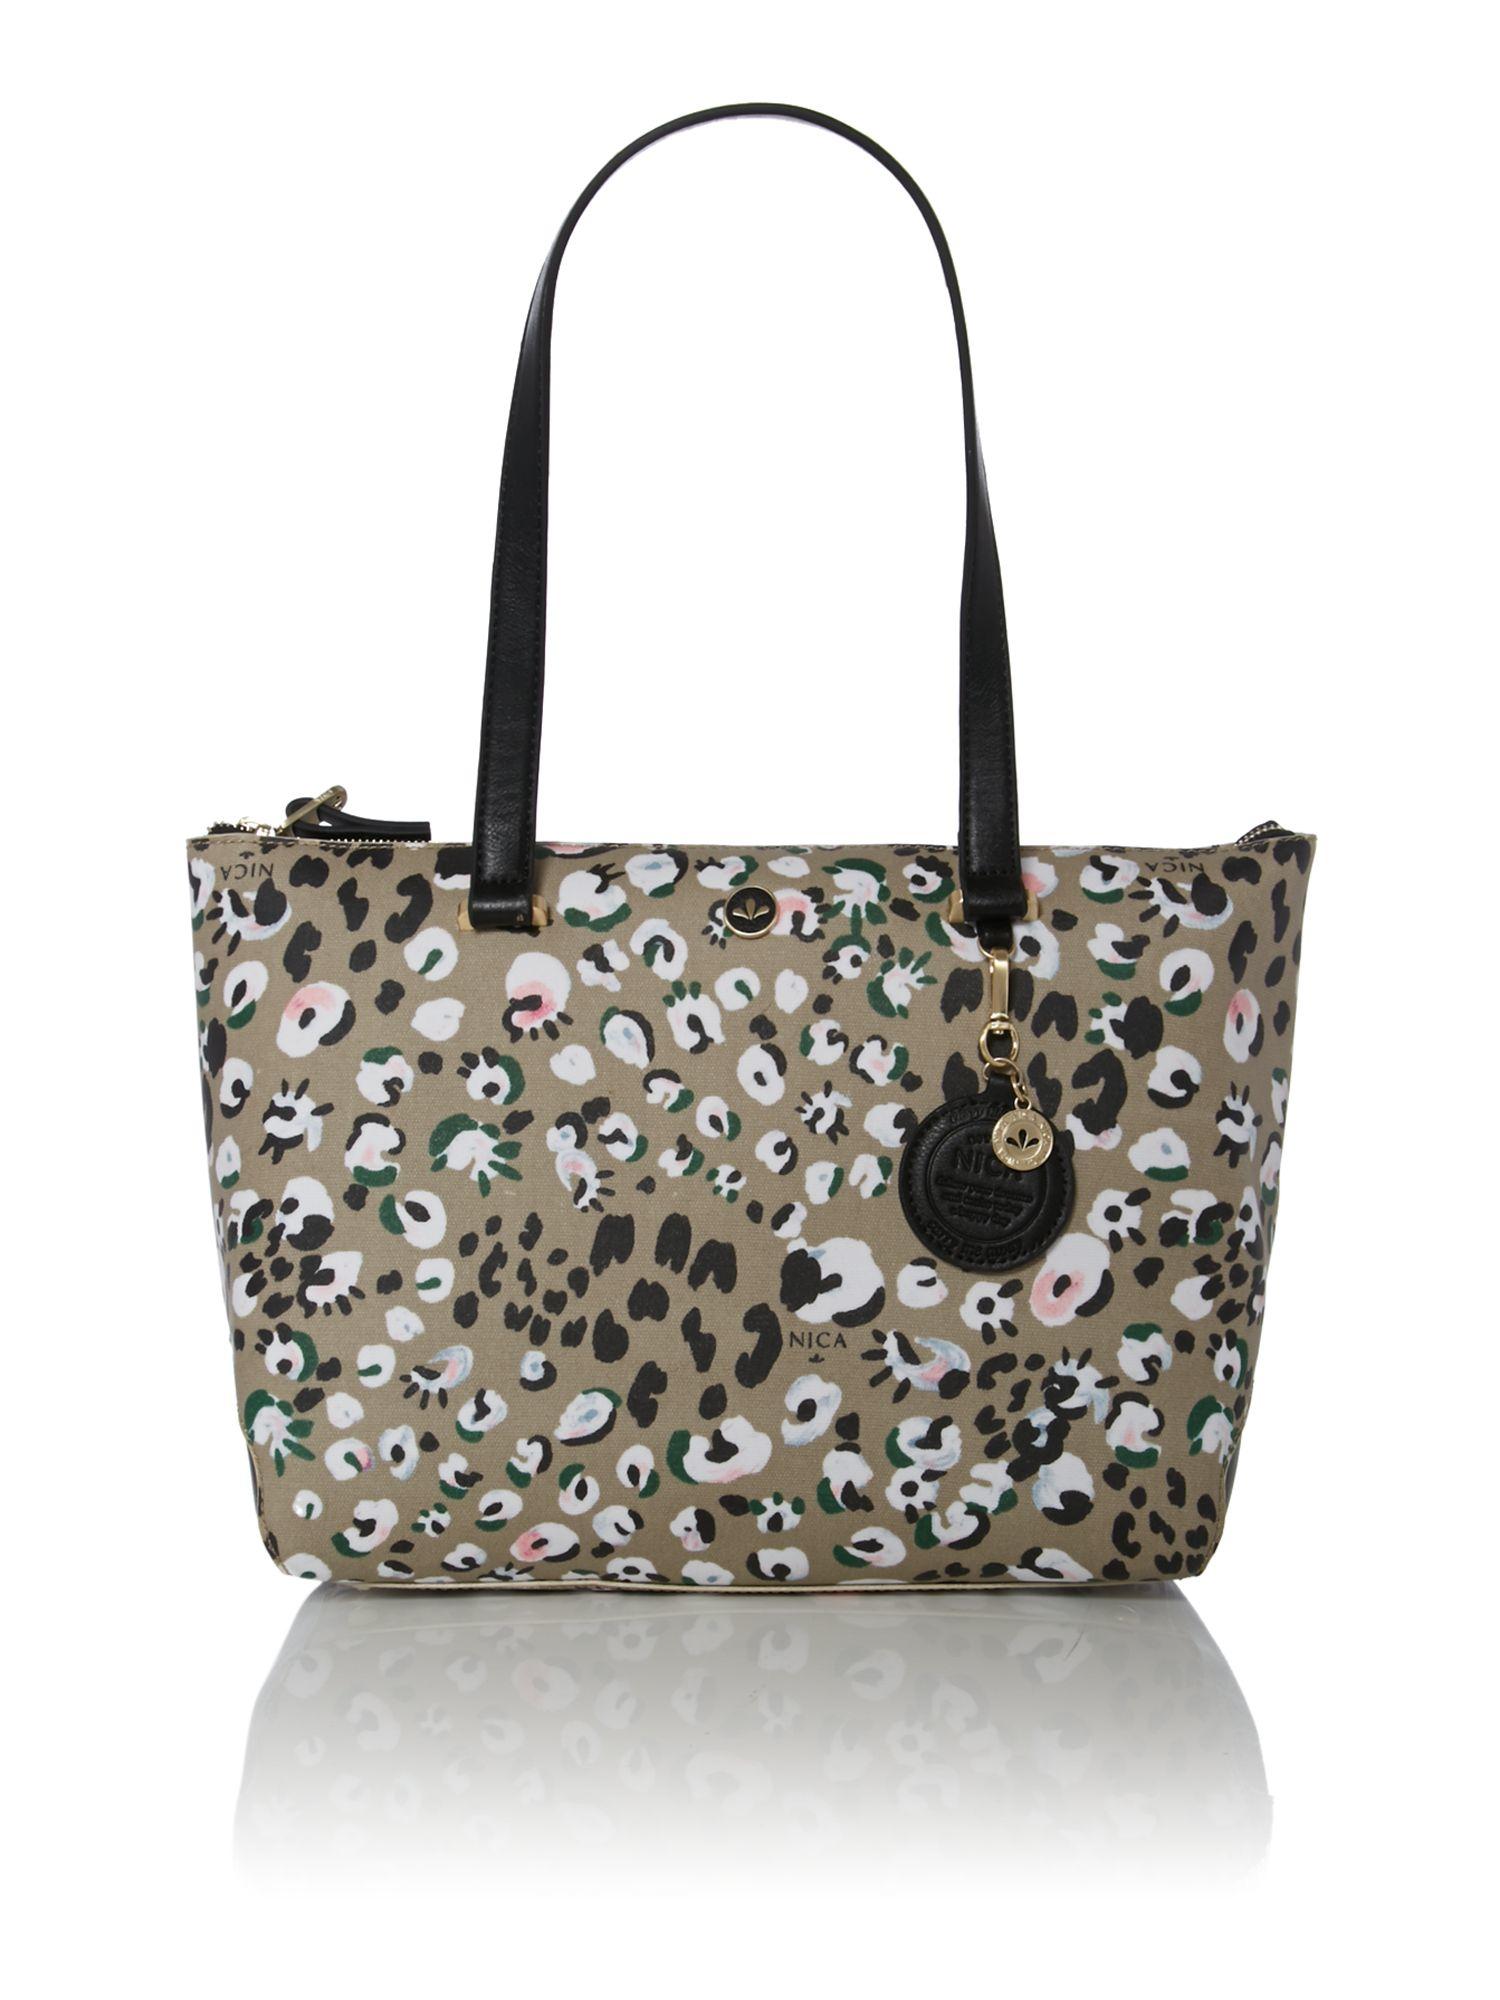 Nica Lana Multi Coloured Tote Bag